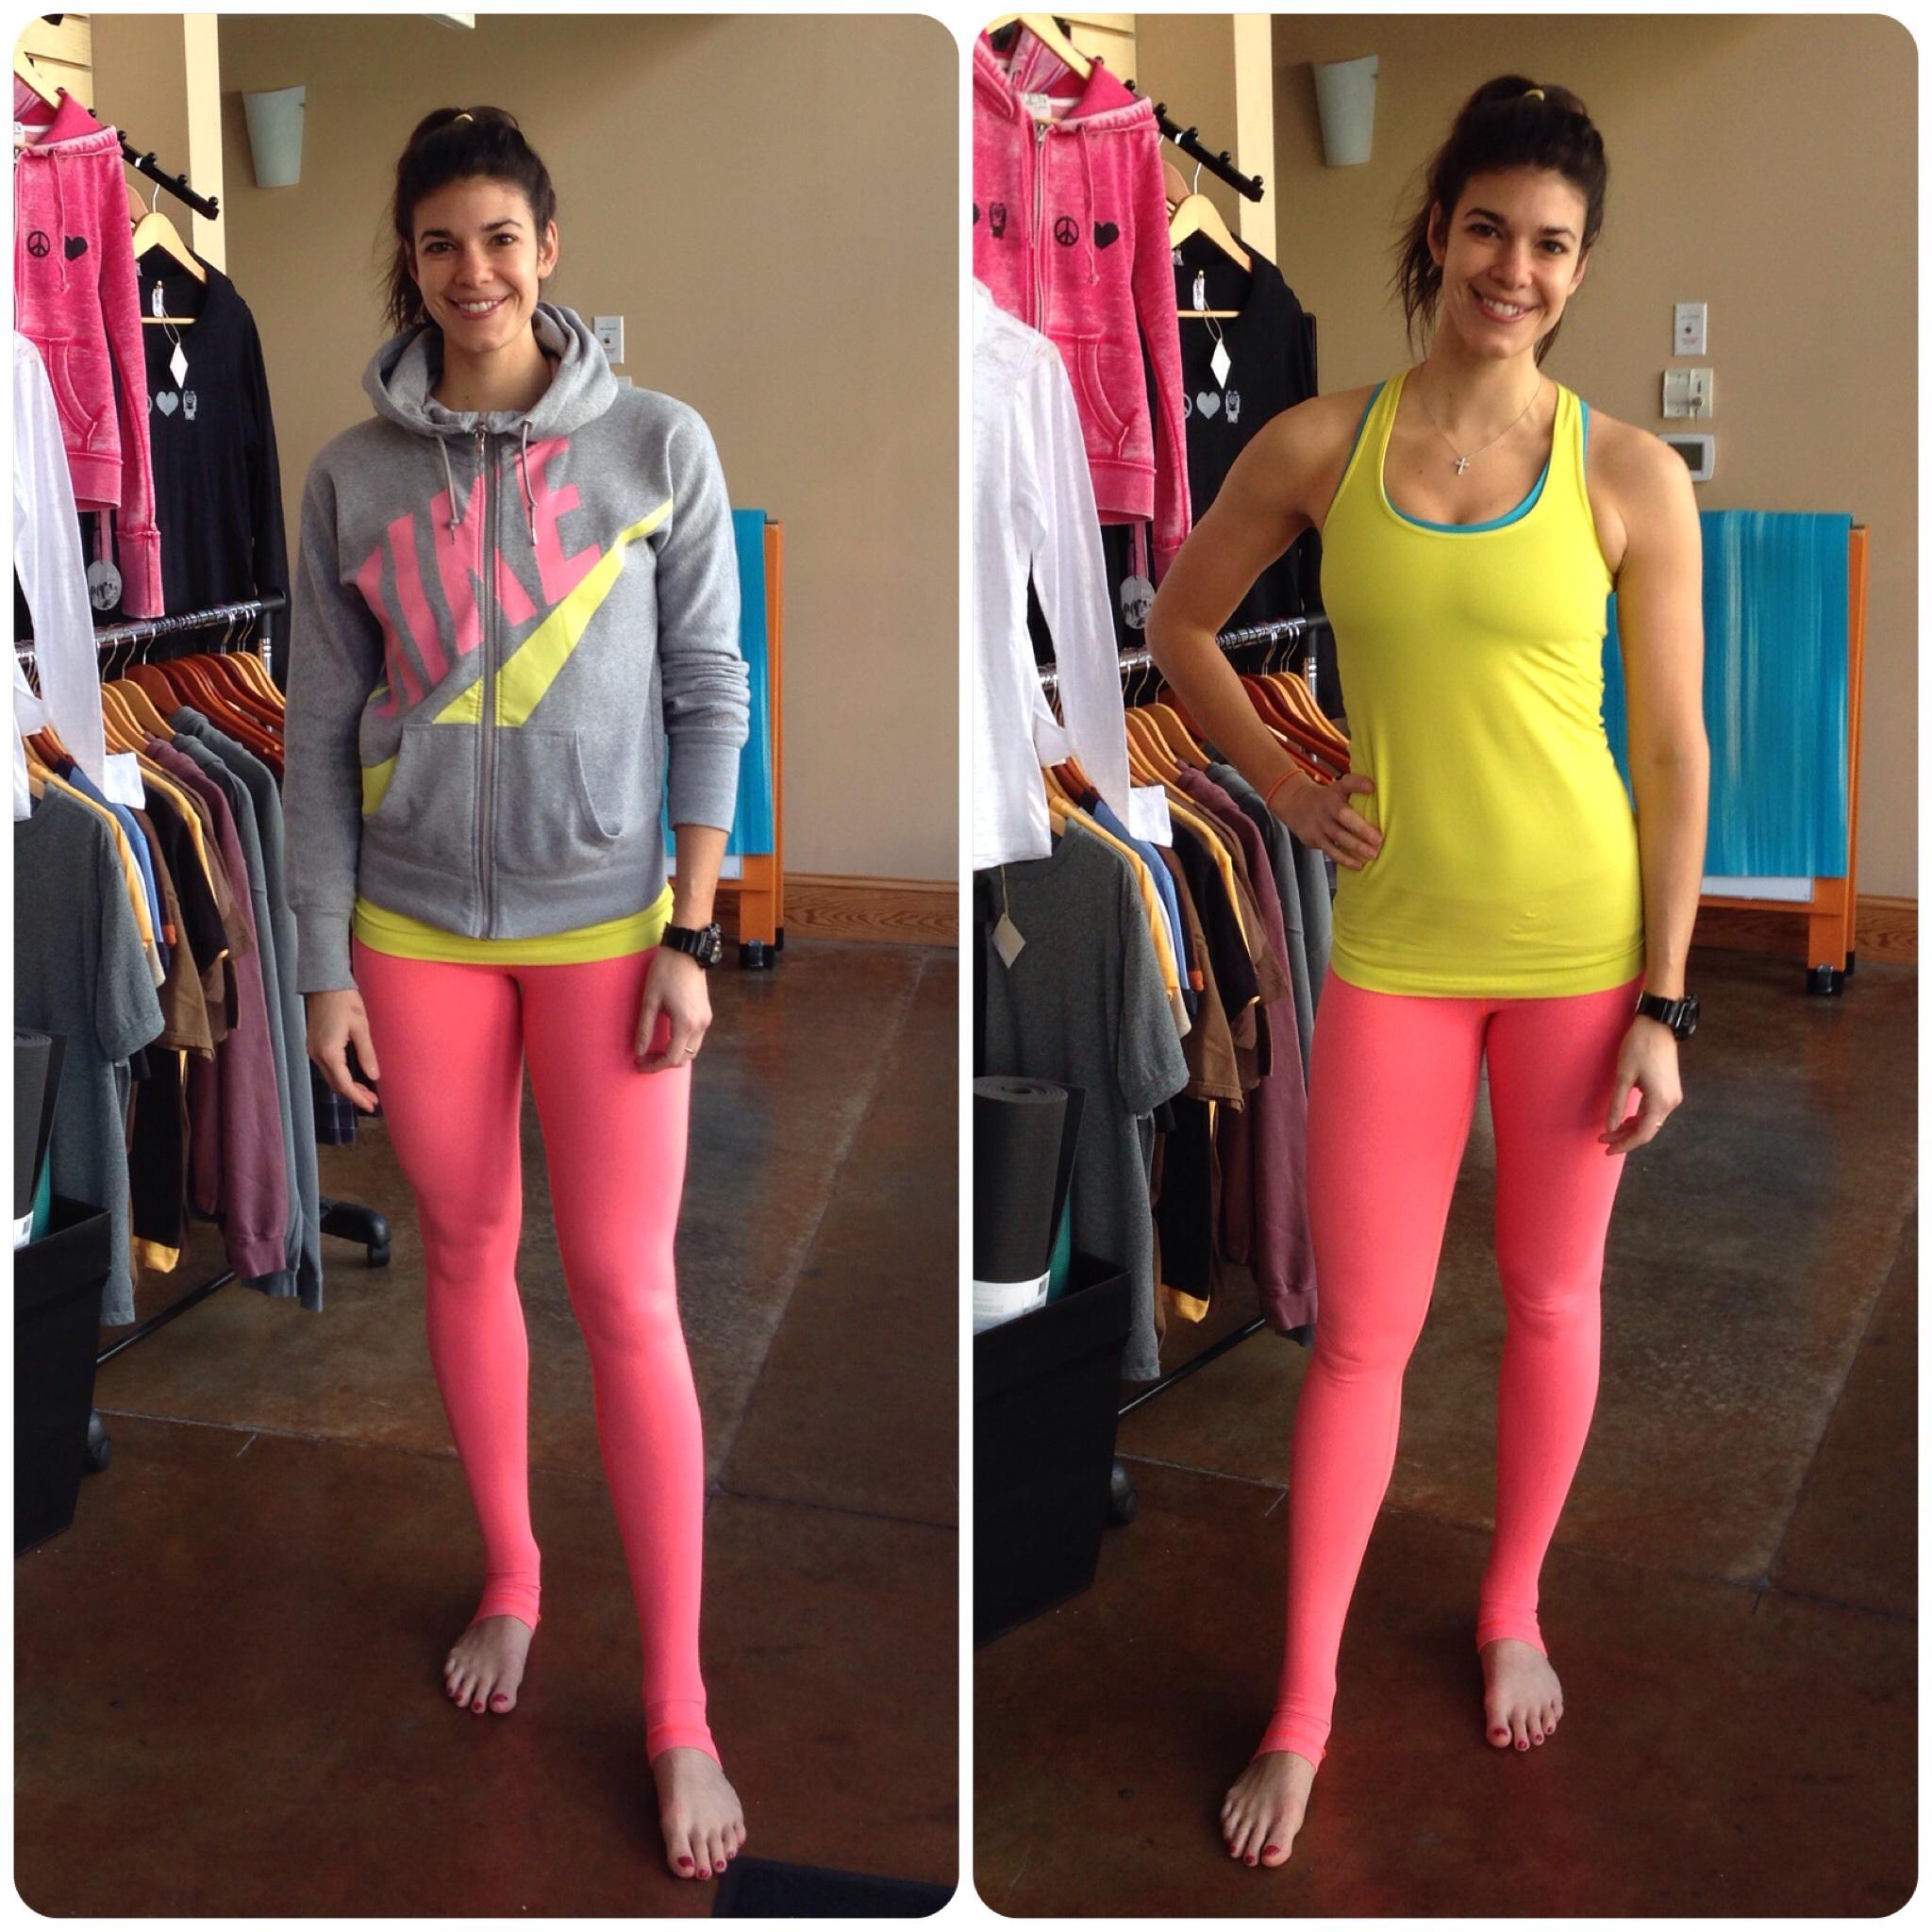 Fitness Fashion - LuluLemon - LS Style